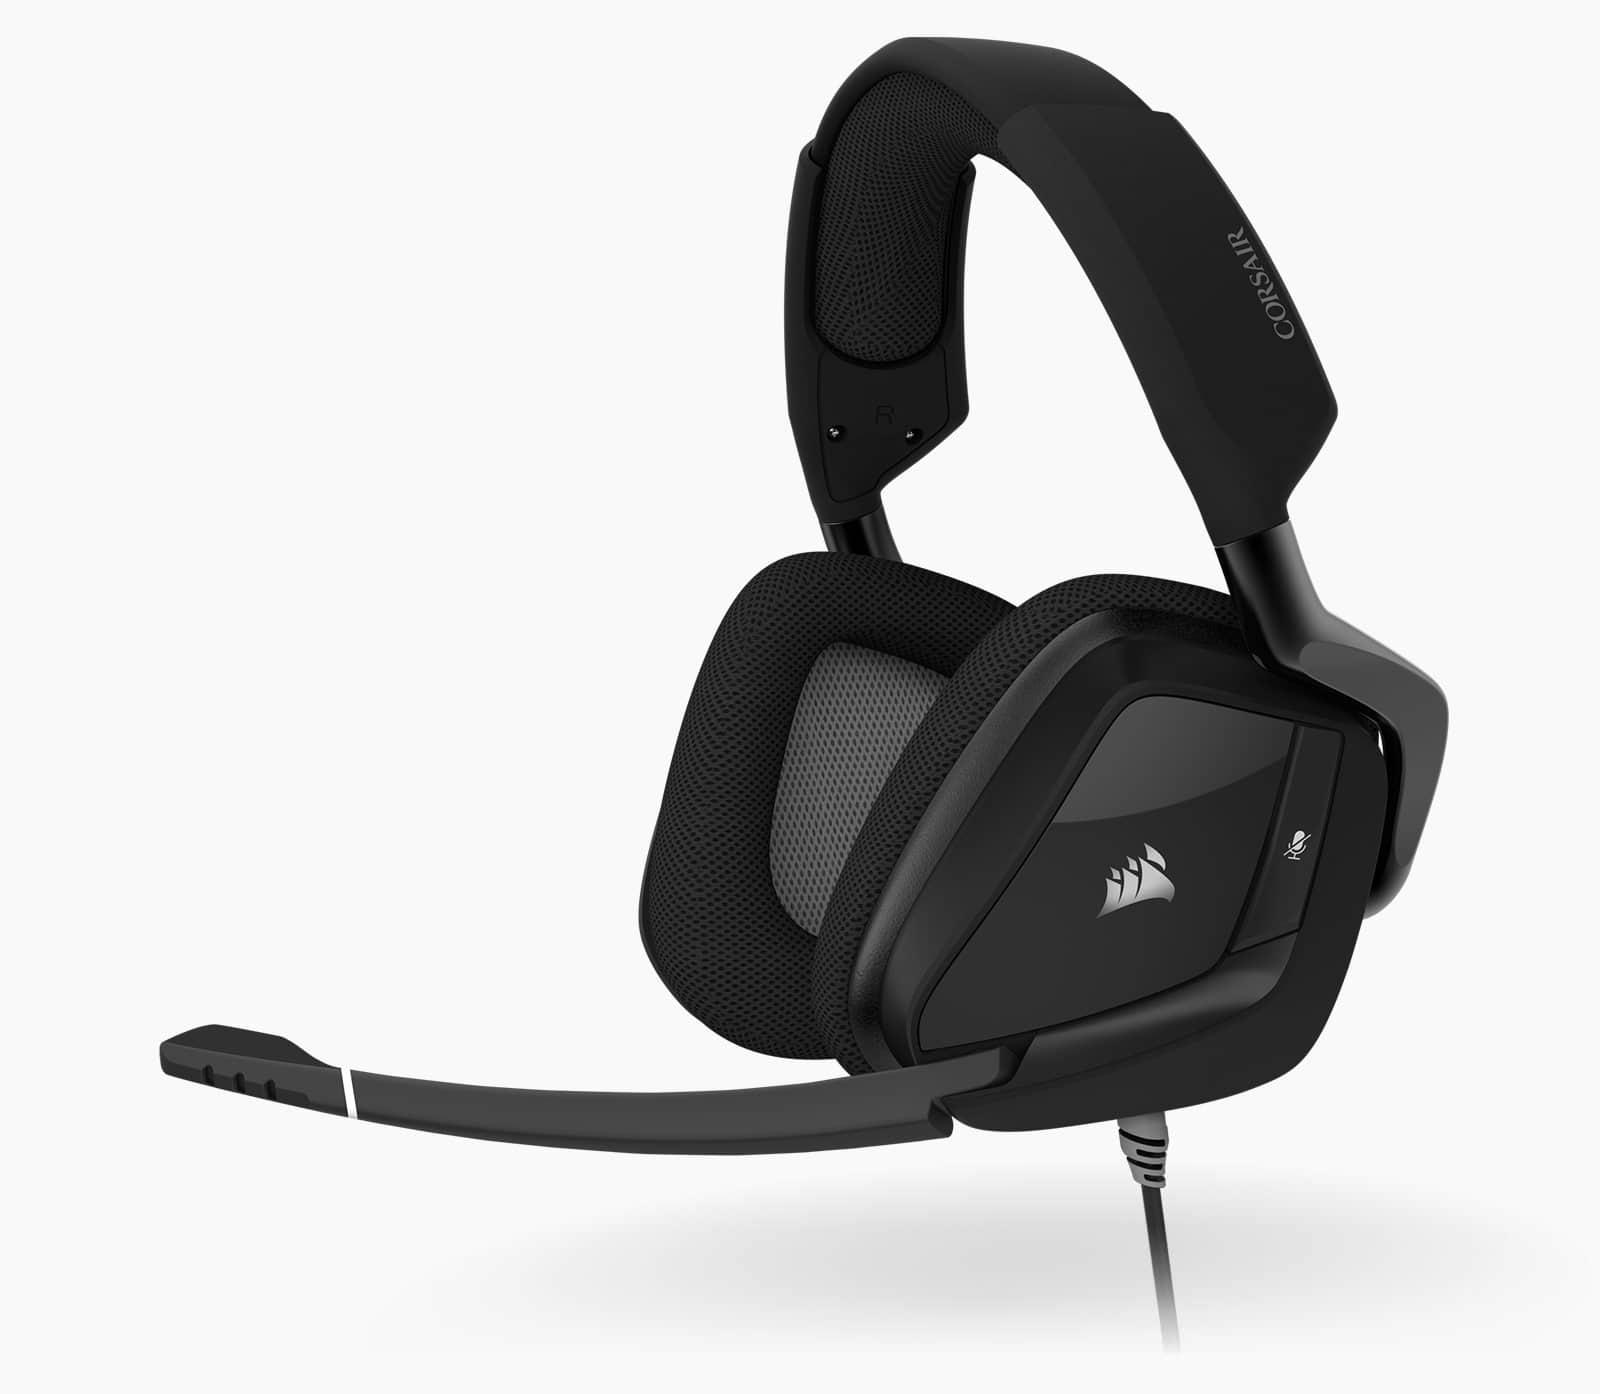 Corsair VOID RGB ELITE USB Premium Gaming Headset with 7.1 Surround Sound — Carbon 14